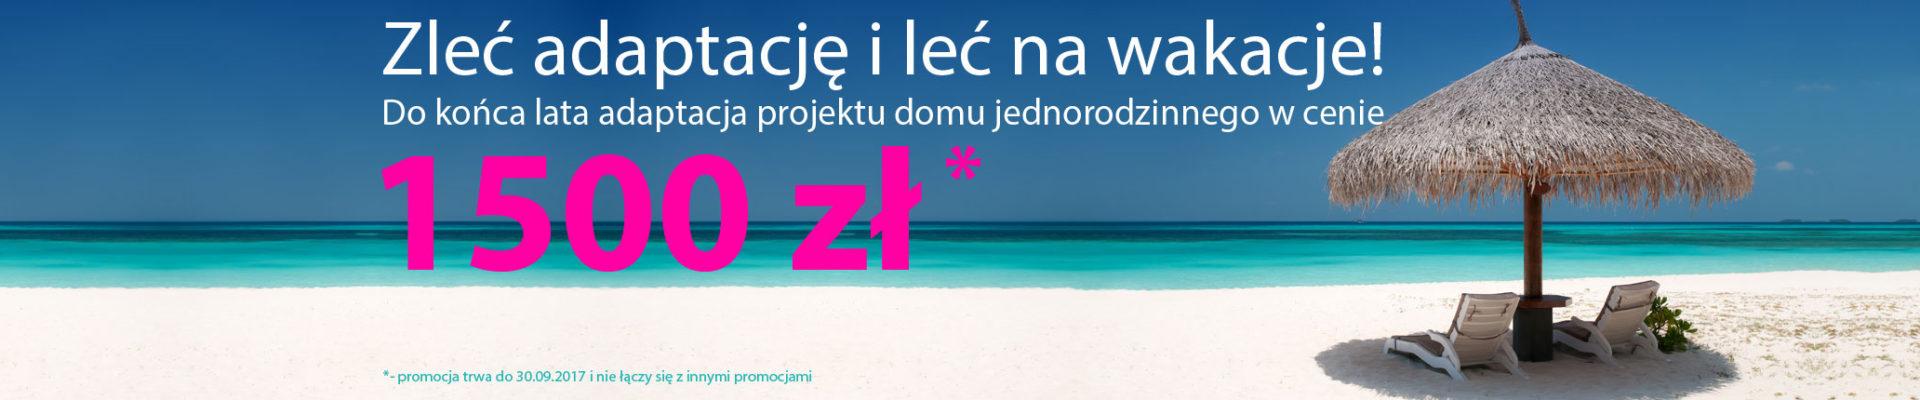 adaptacja24.pl |Letnia promocja